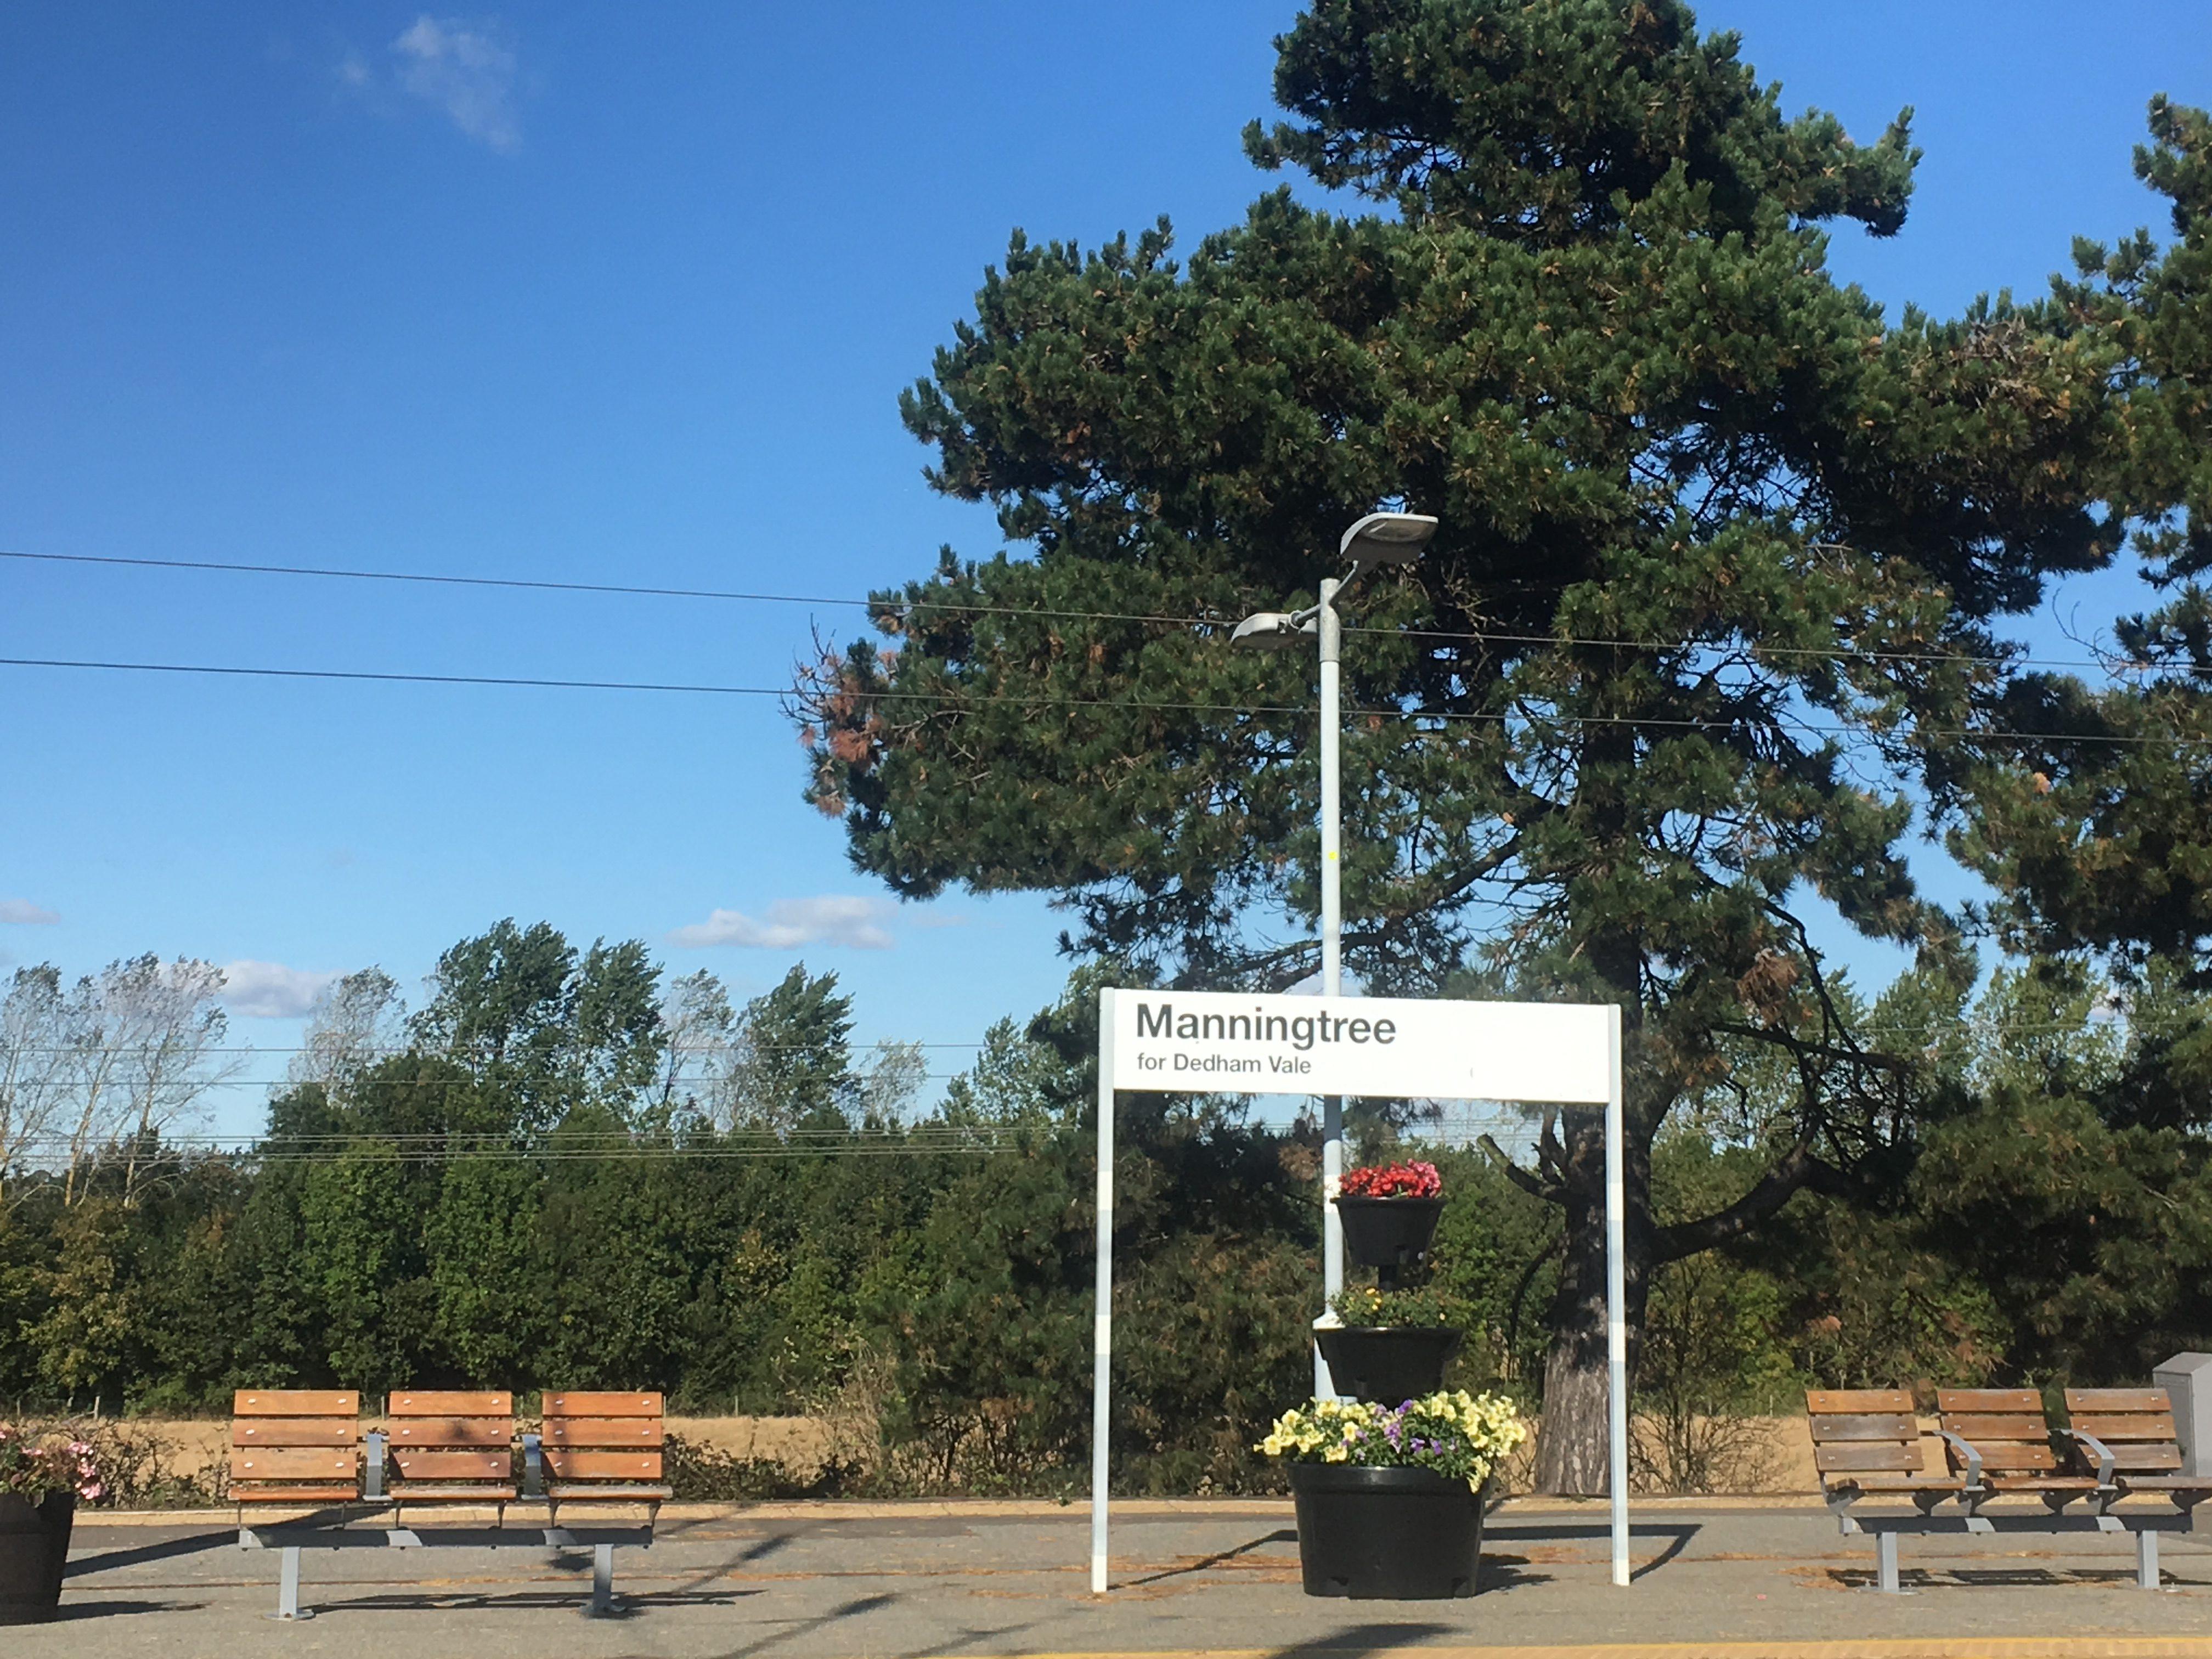 Dedham Vale for Manningtree and visa versa